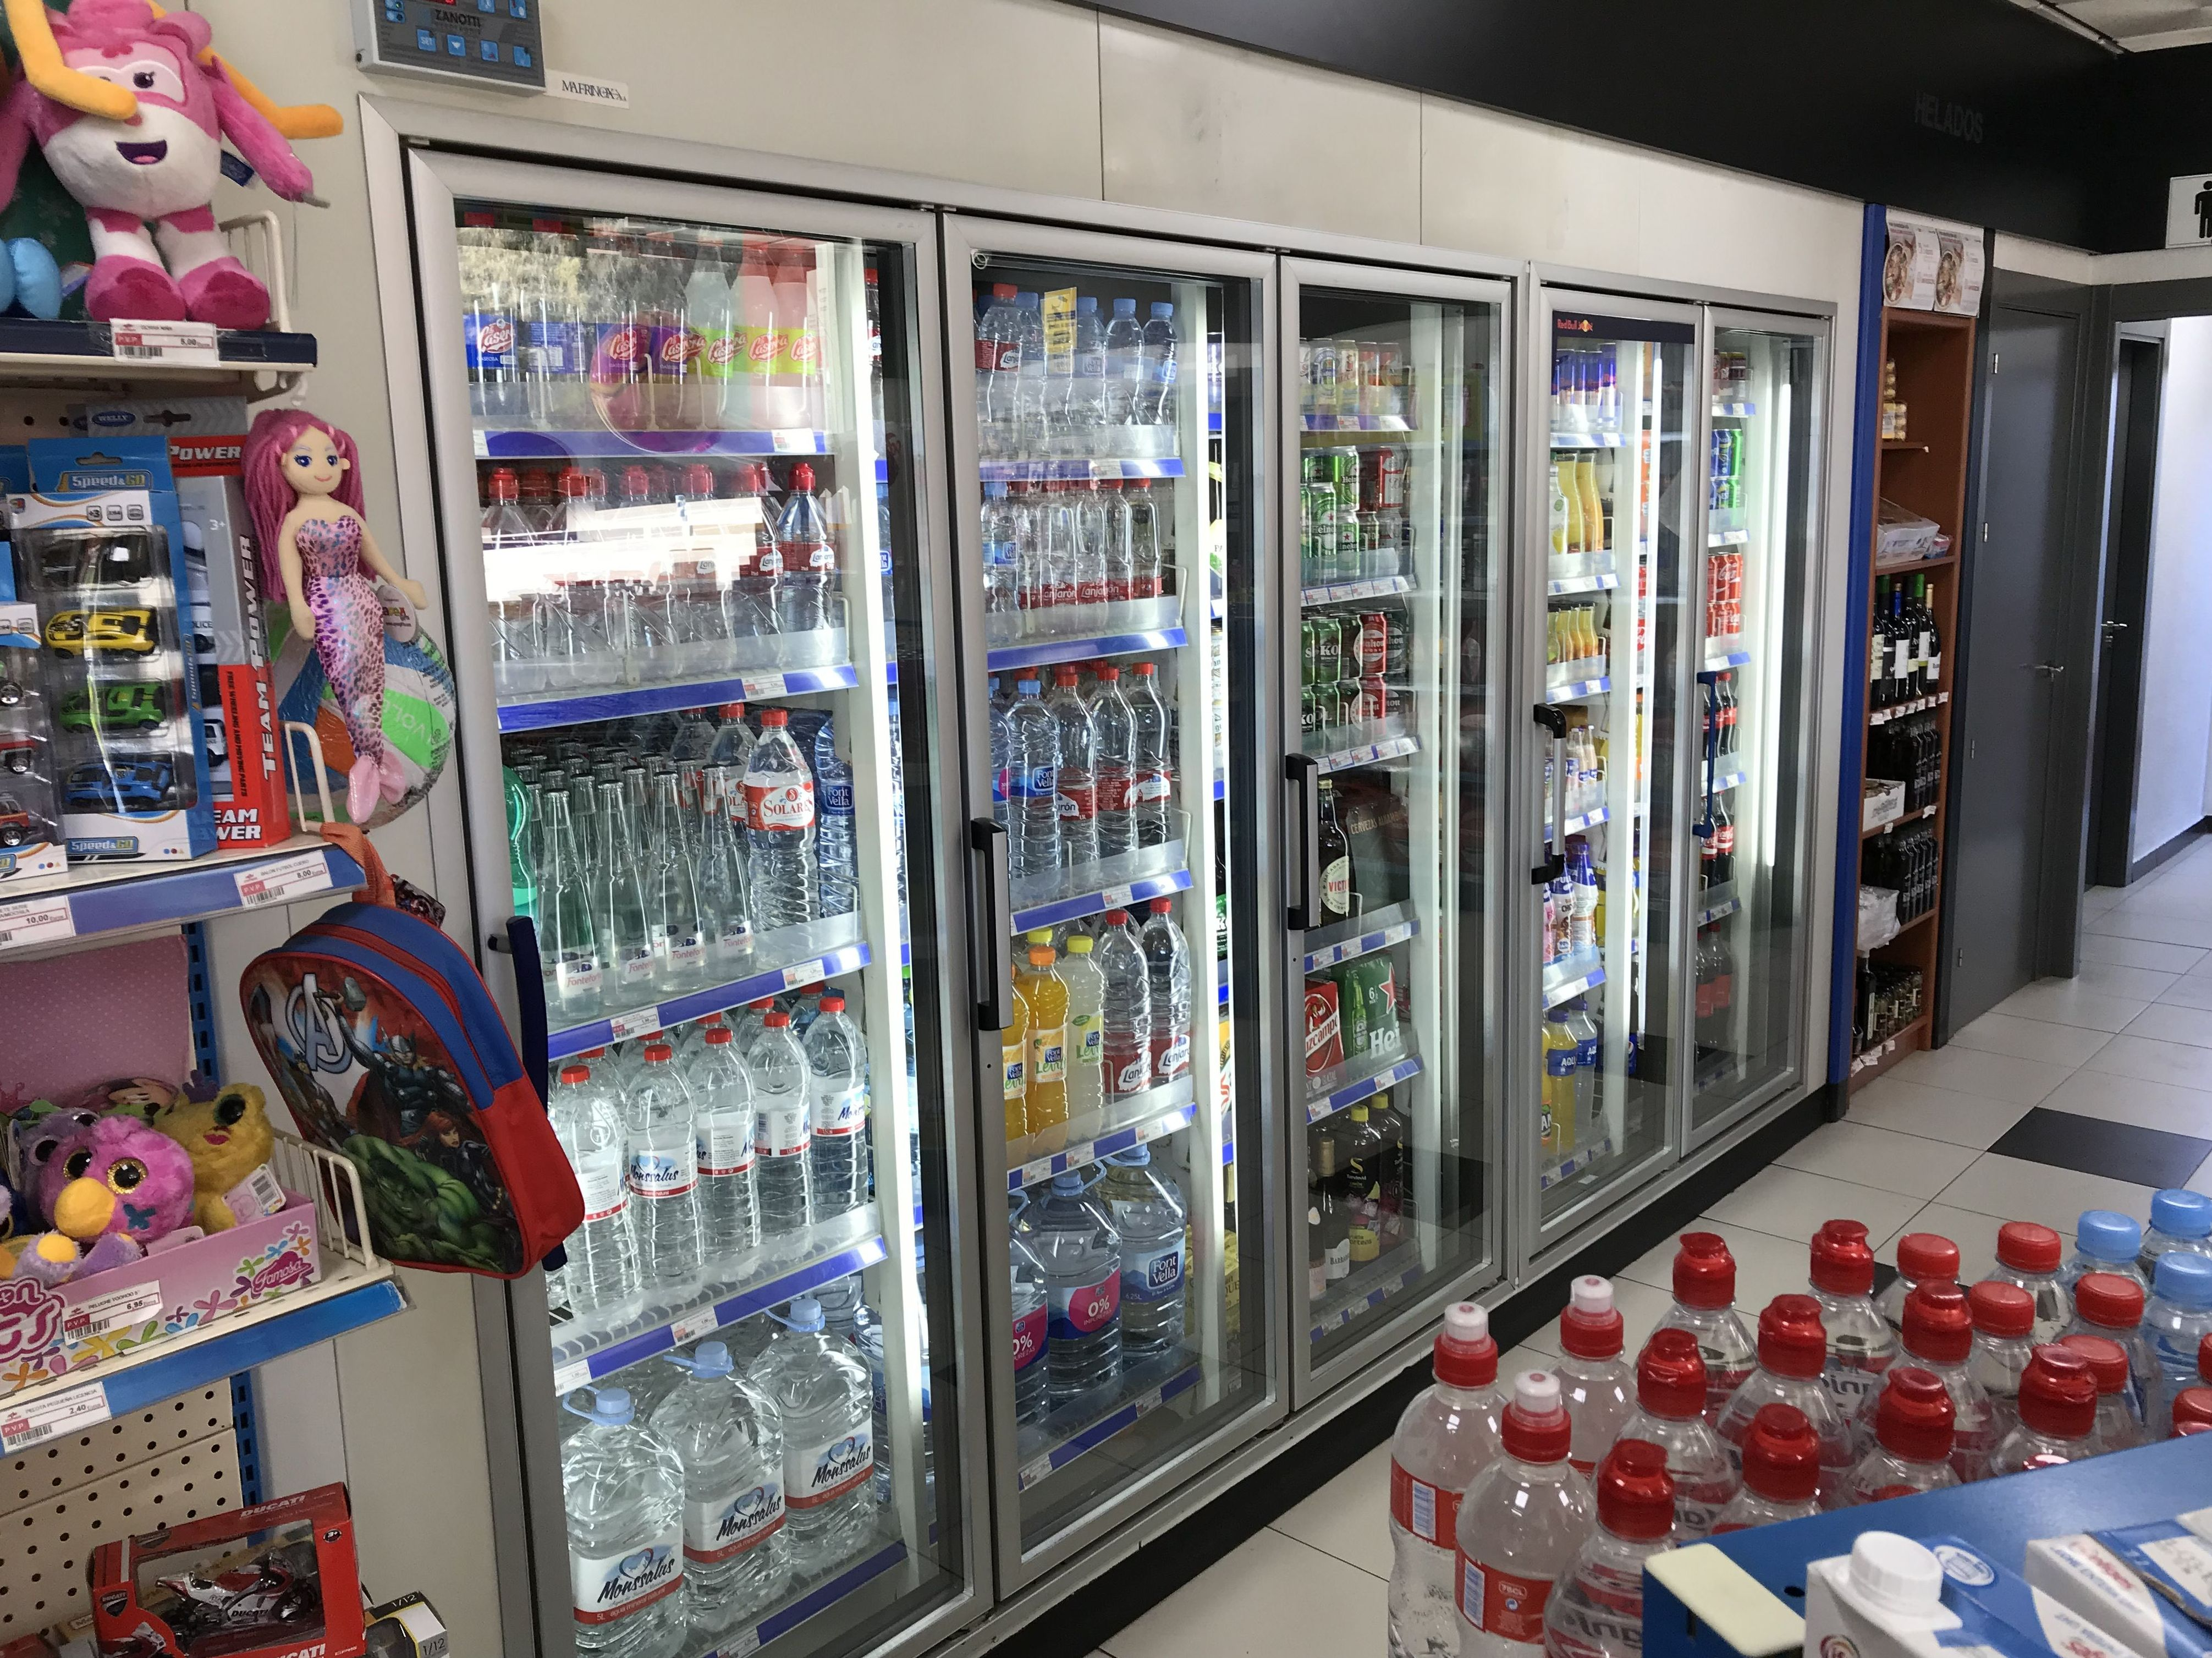 Supermercado: Servicios de Cepsa Cajiz